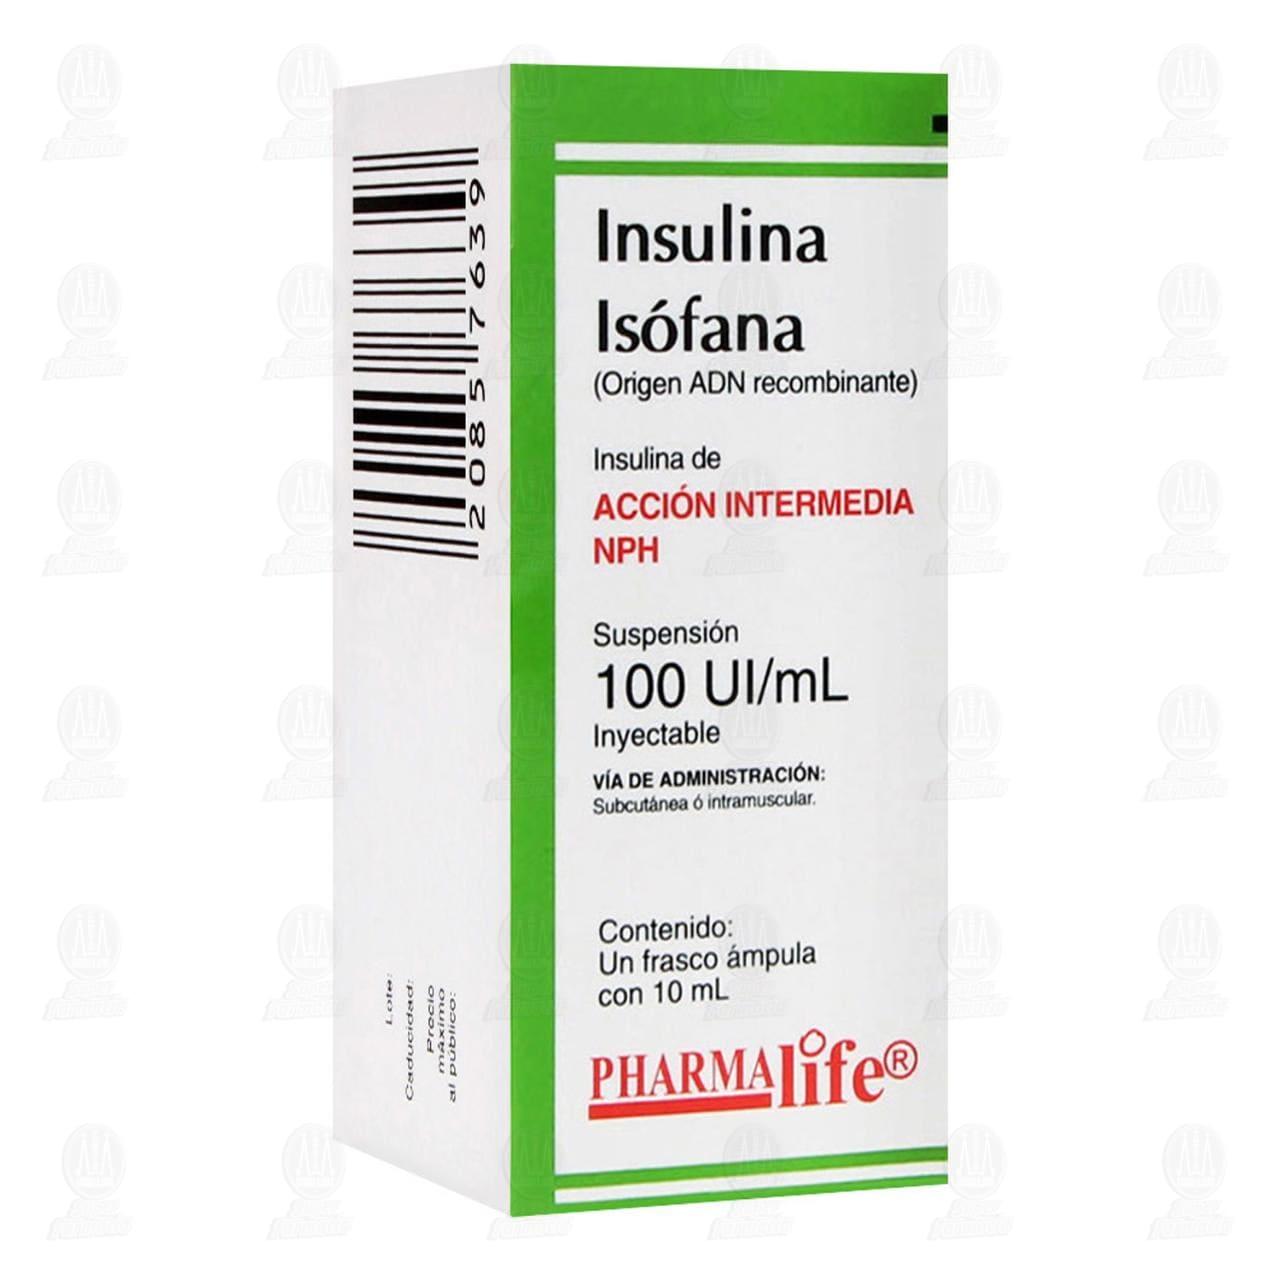 Insulina Isófana NPH 100ui/ml 1 Frasco Ámpula 10ml Suspensión Inyectable Pharmalife